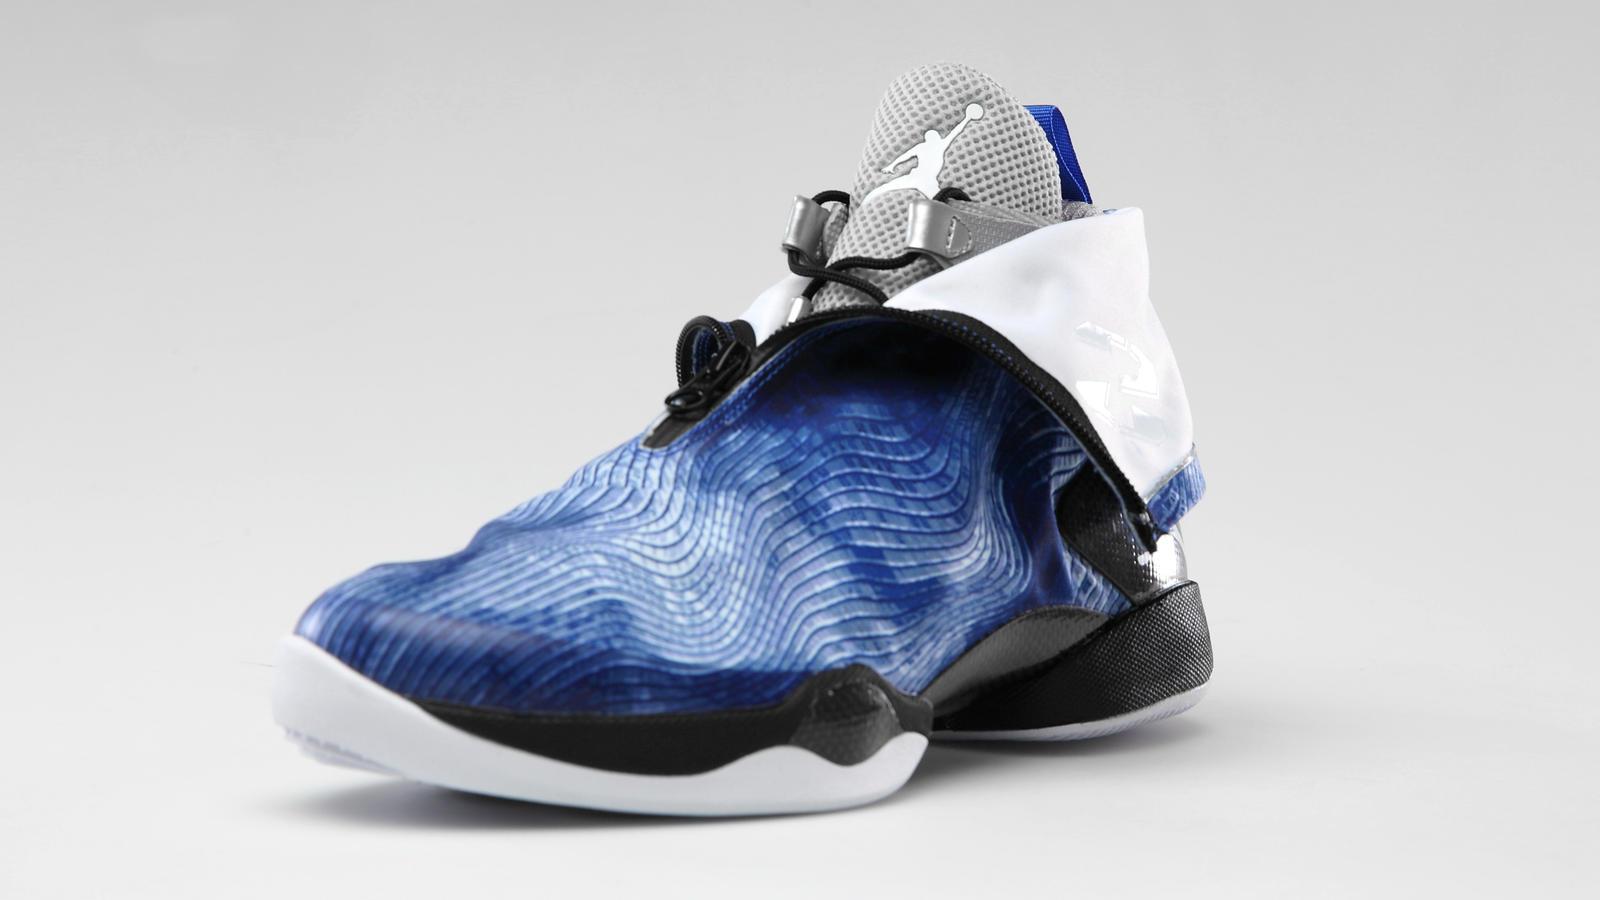 Nike News - RUSSELL WESTBROOK UNVEILS A NEW AIR JORDAN XX8 ...